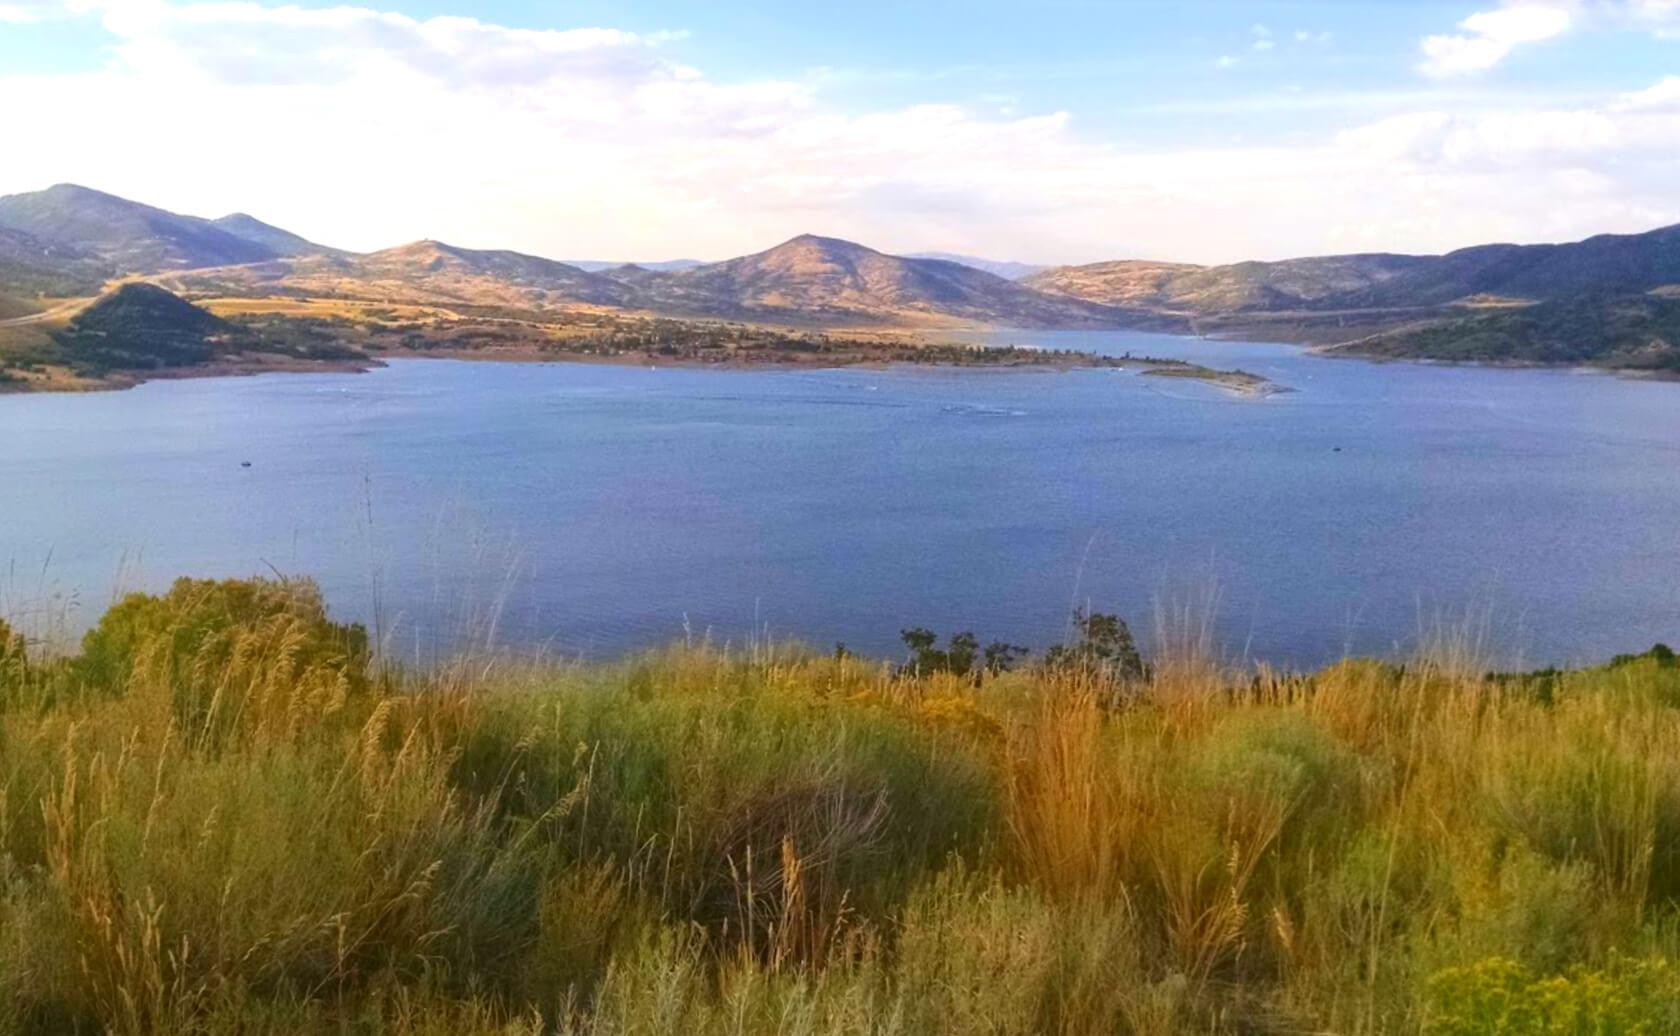 Jordanelle-Lake-Fishing-Guide-Report-Idaho-2